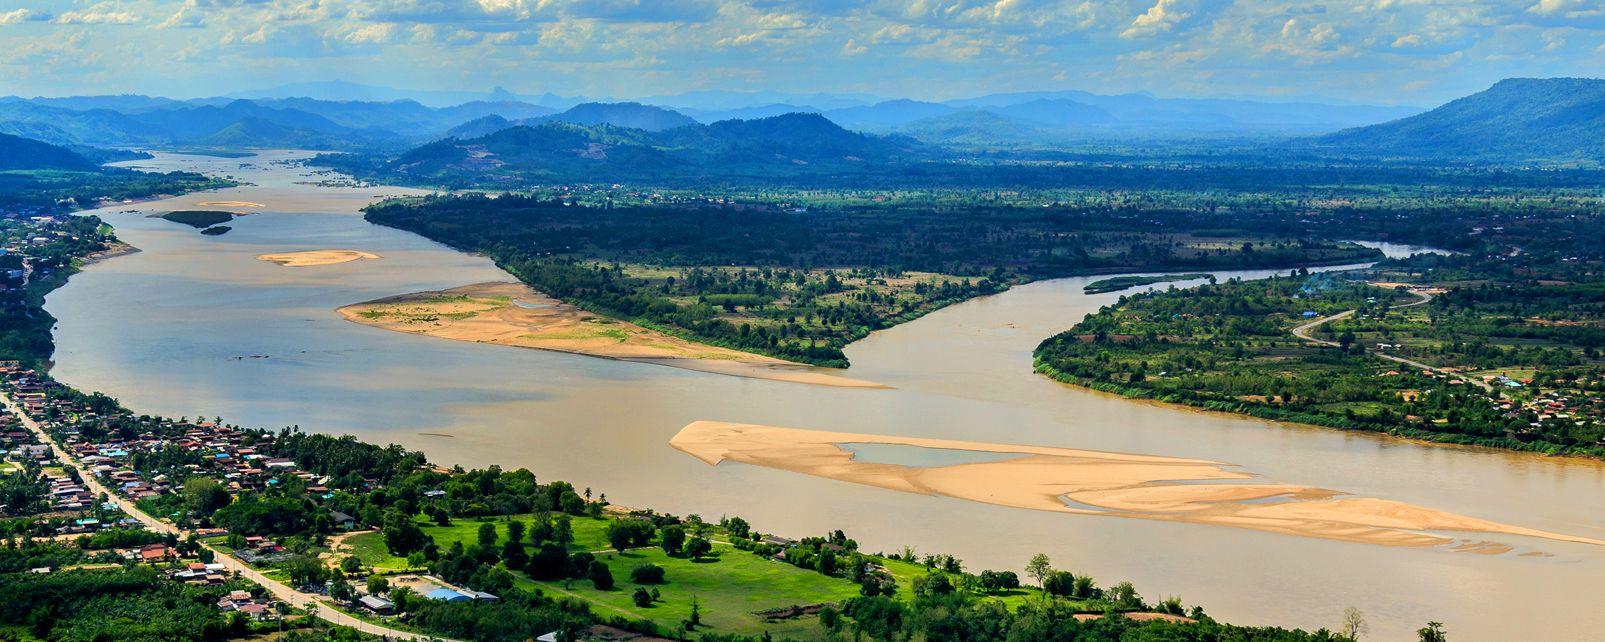 The Mekong Plain Cambodia